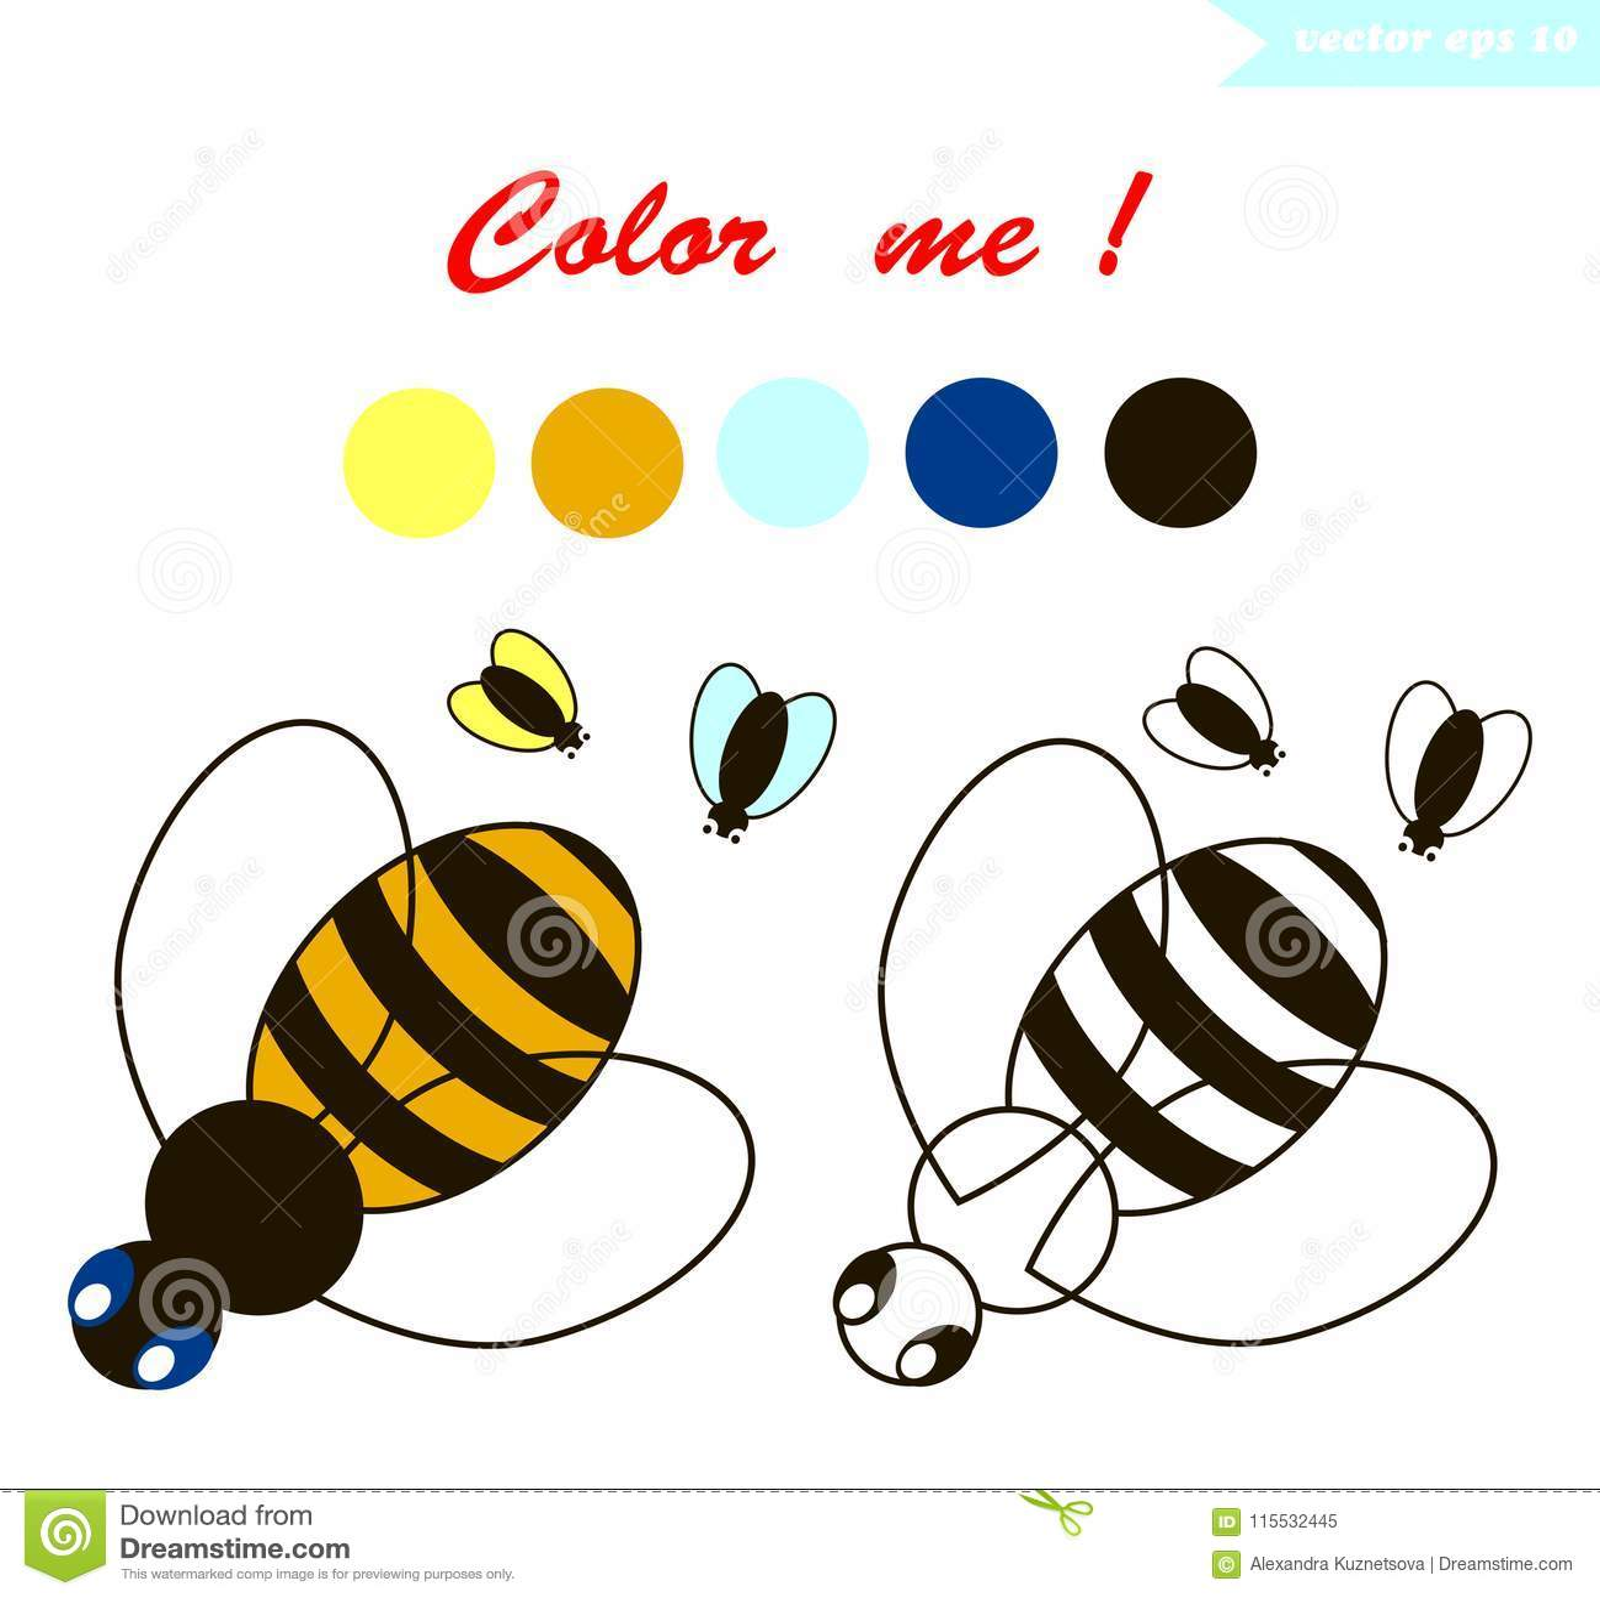 Simple Educational Kids Coloring Page Cartoon Vector